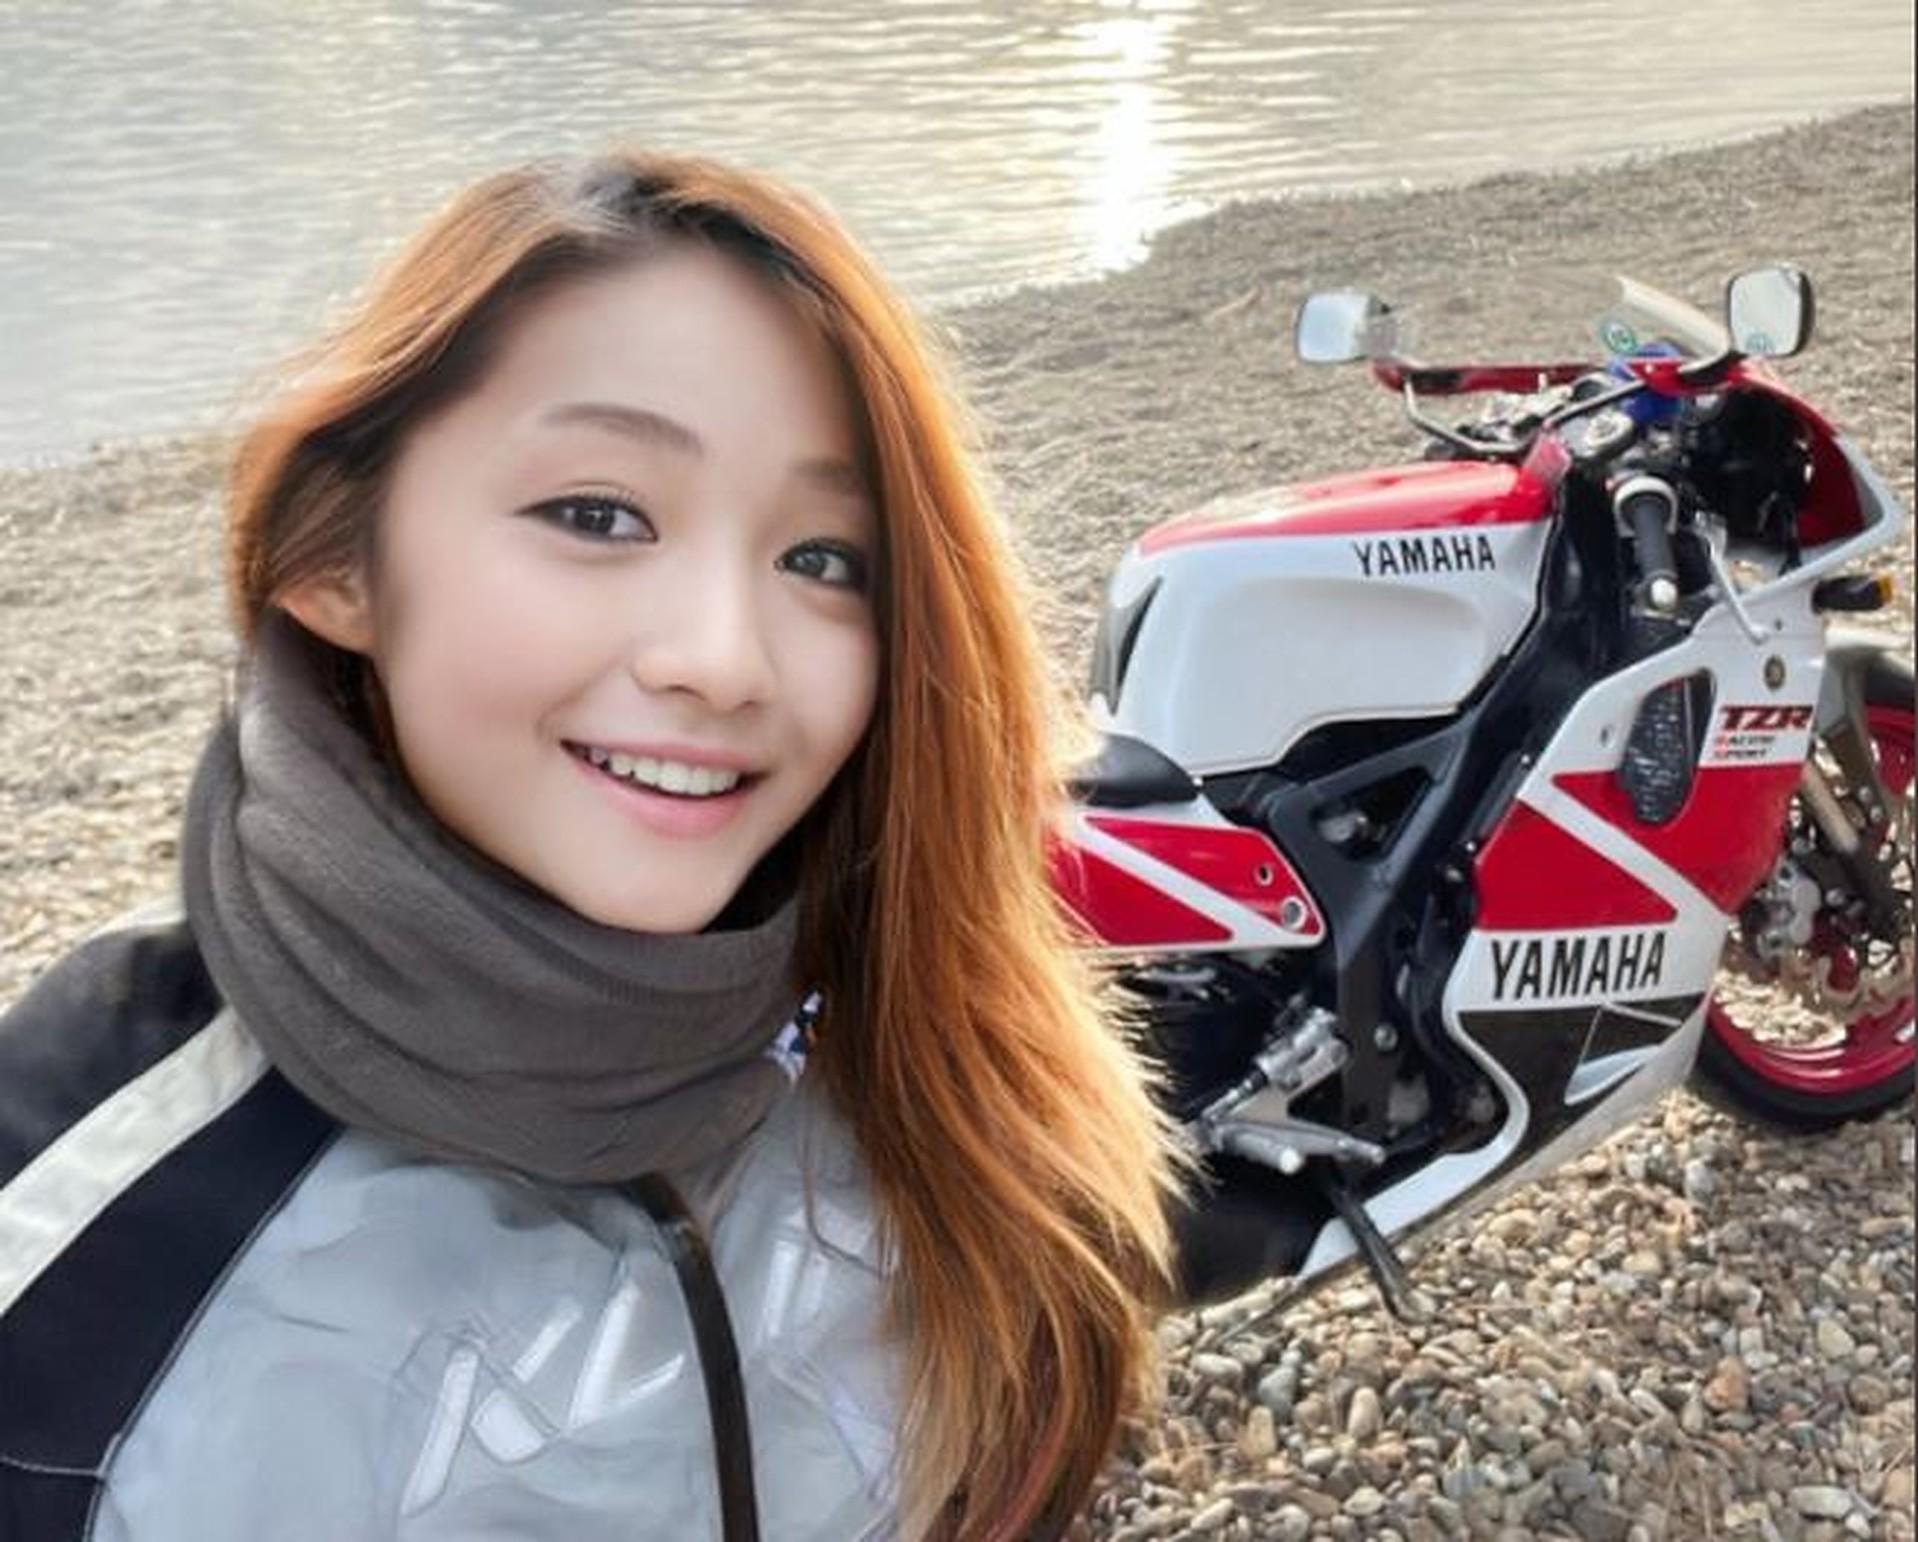 Japan Alter Mann Junges Mädchen